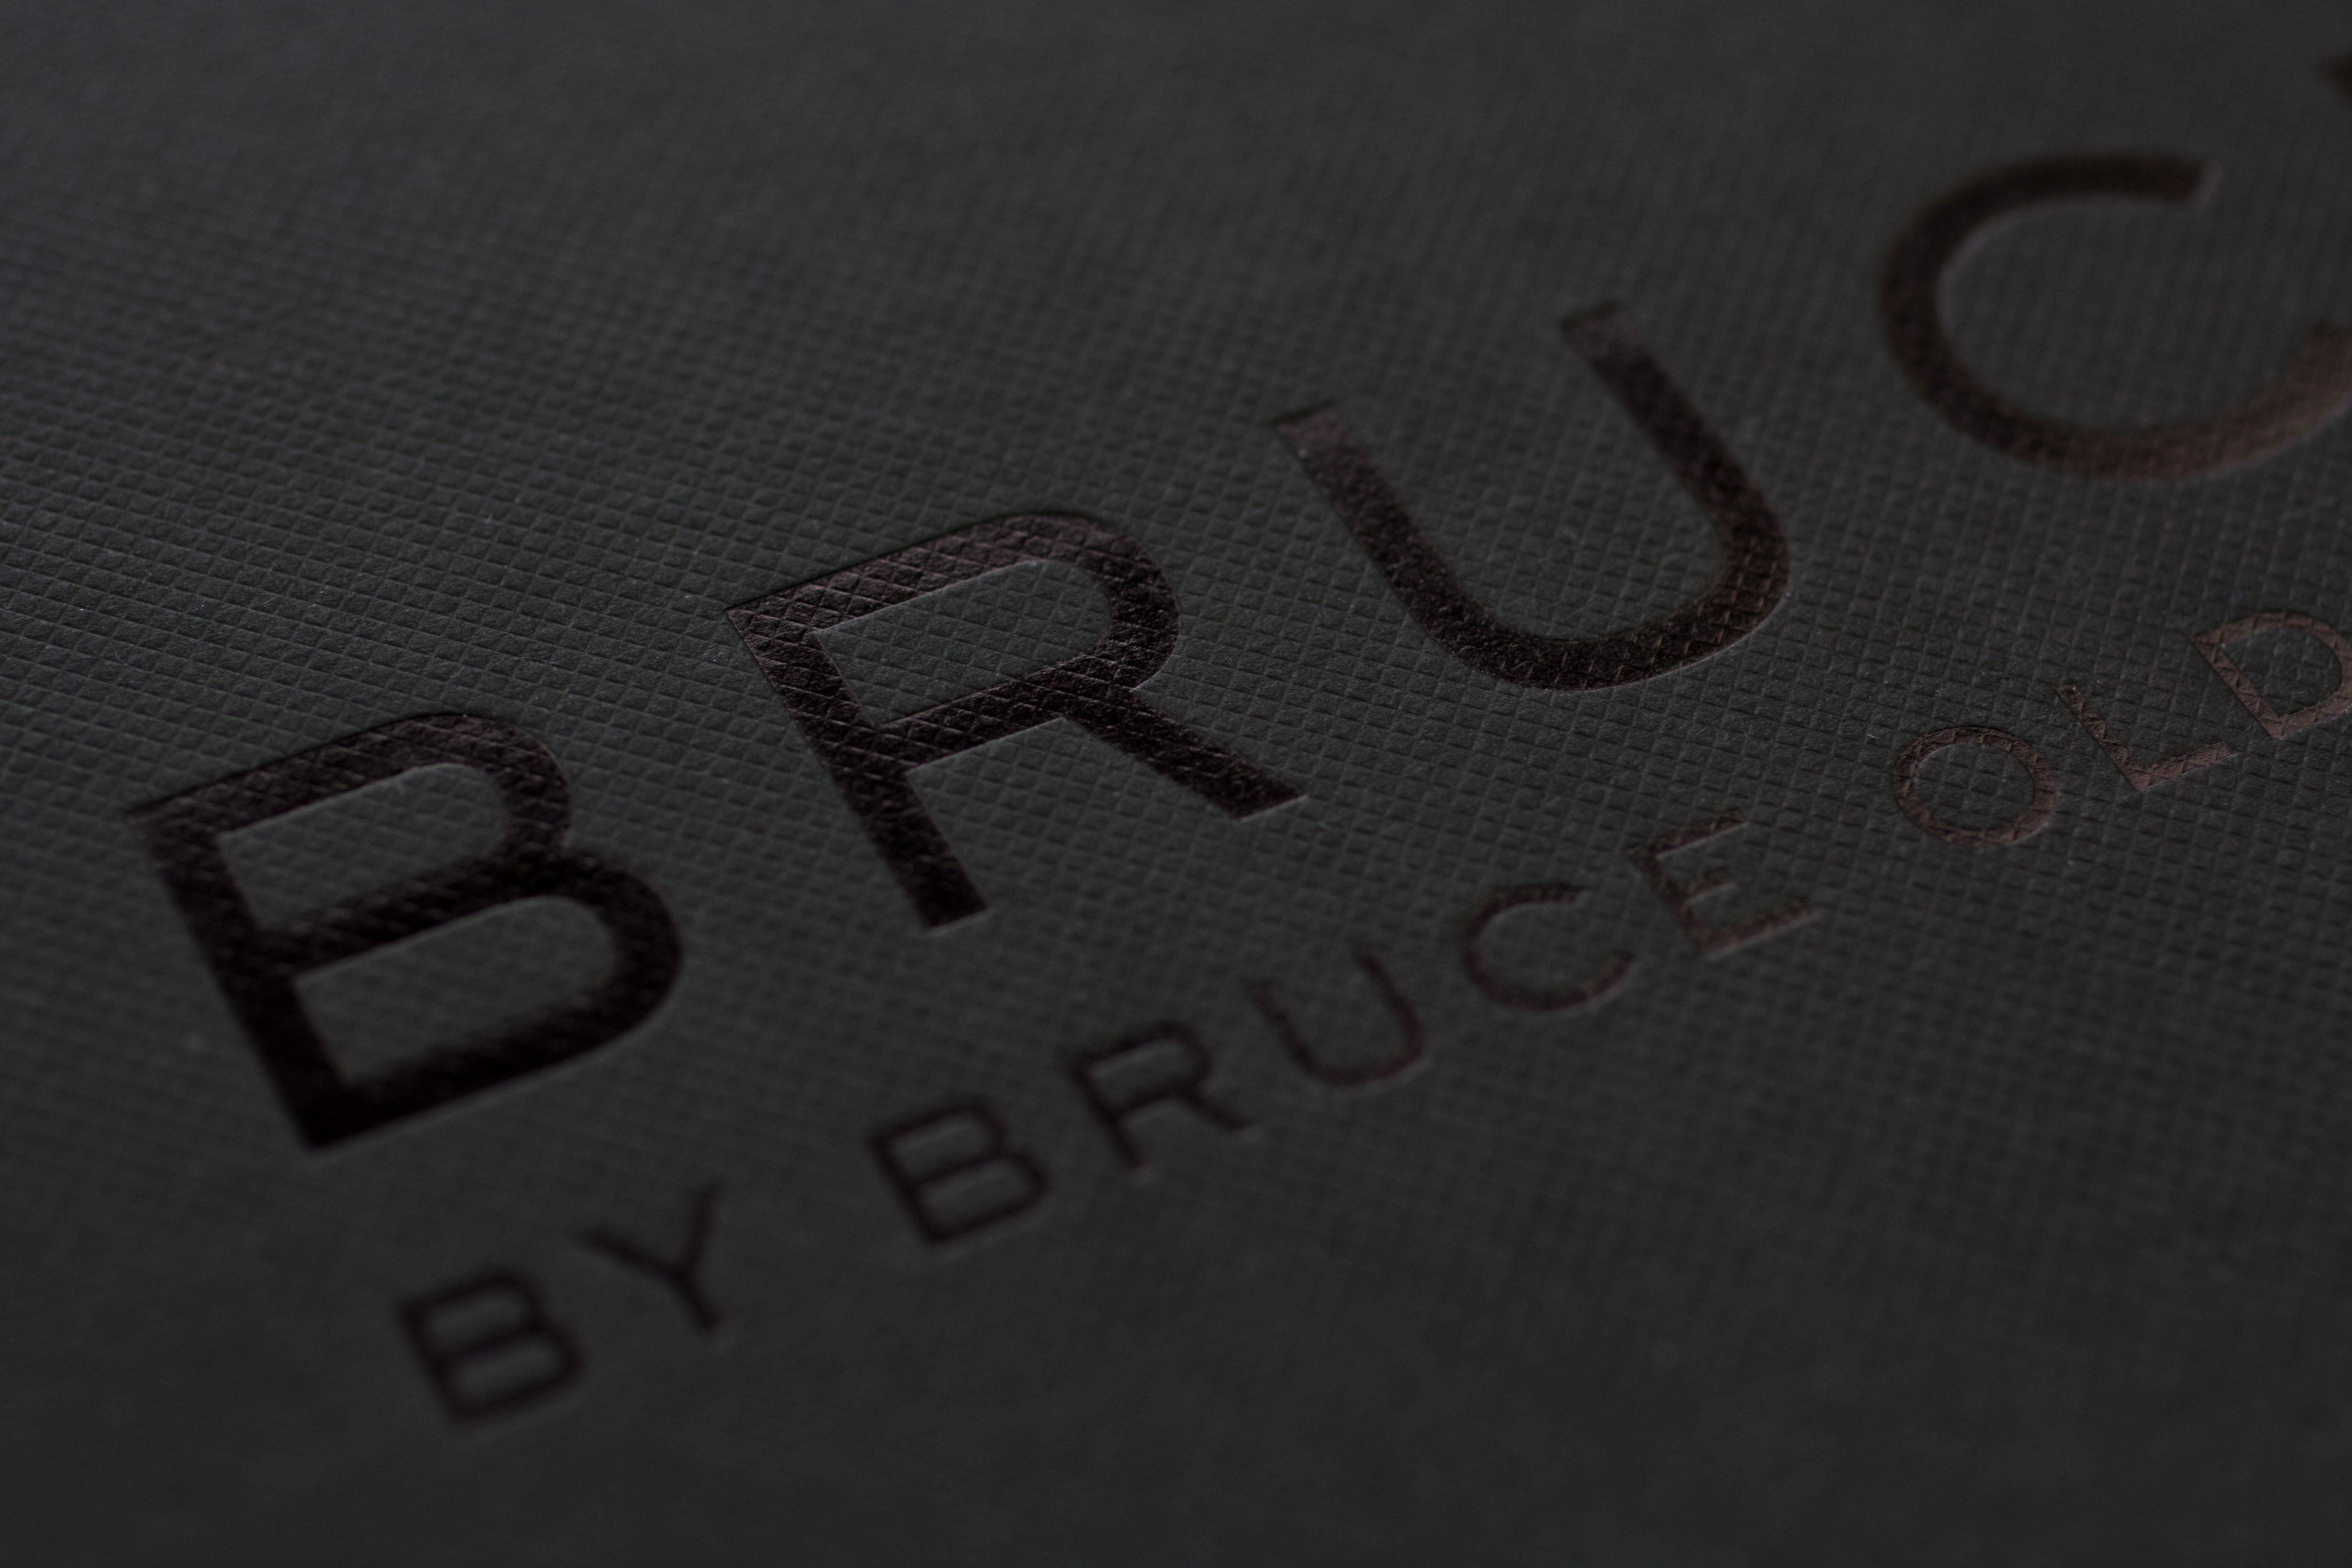 Jl_Bruce_detail